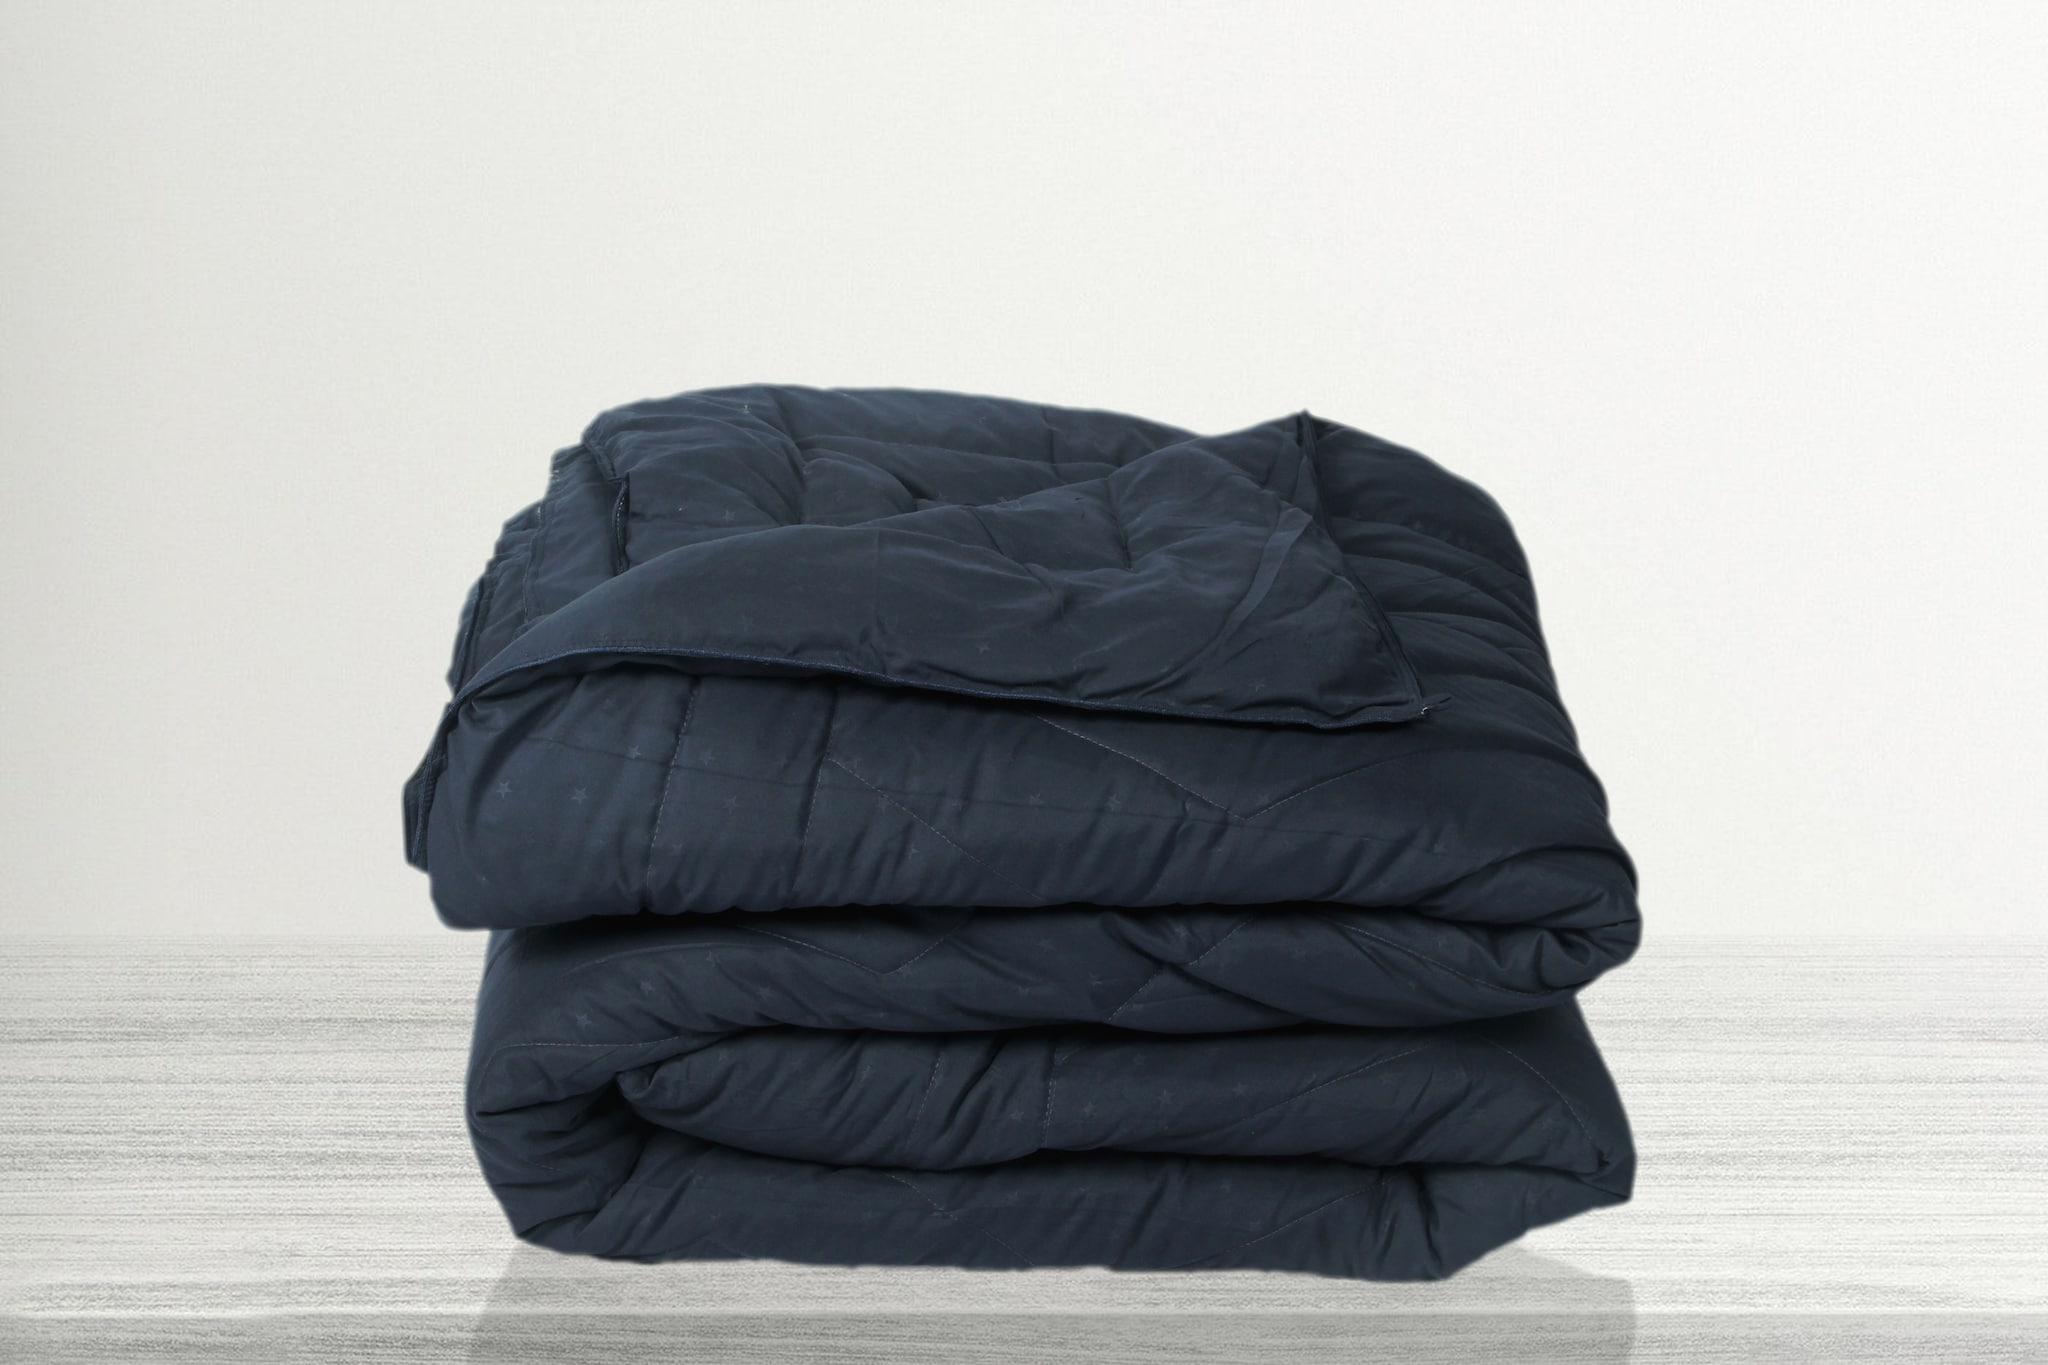 SLEEP STAR COMFORTER (154cm x 224cm SINGLE BED,AVALANCHE BLUE)